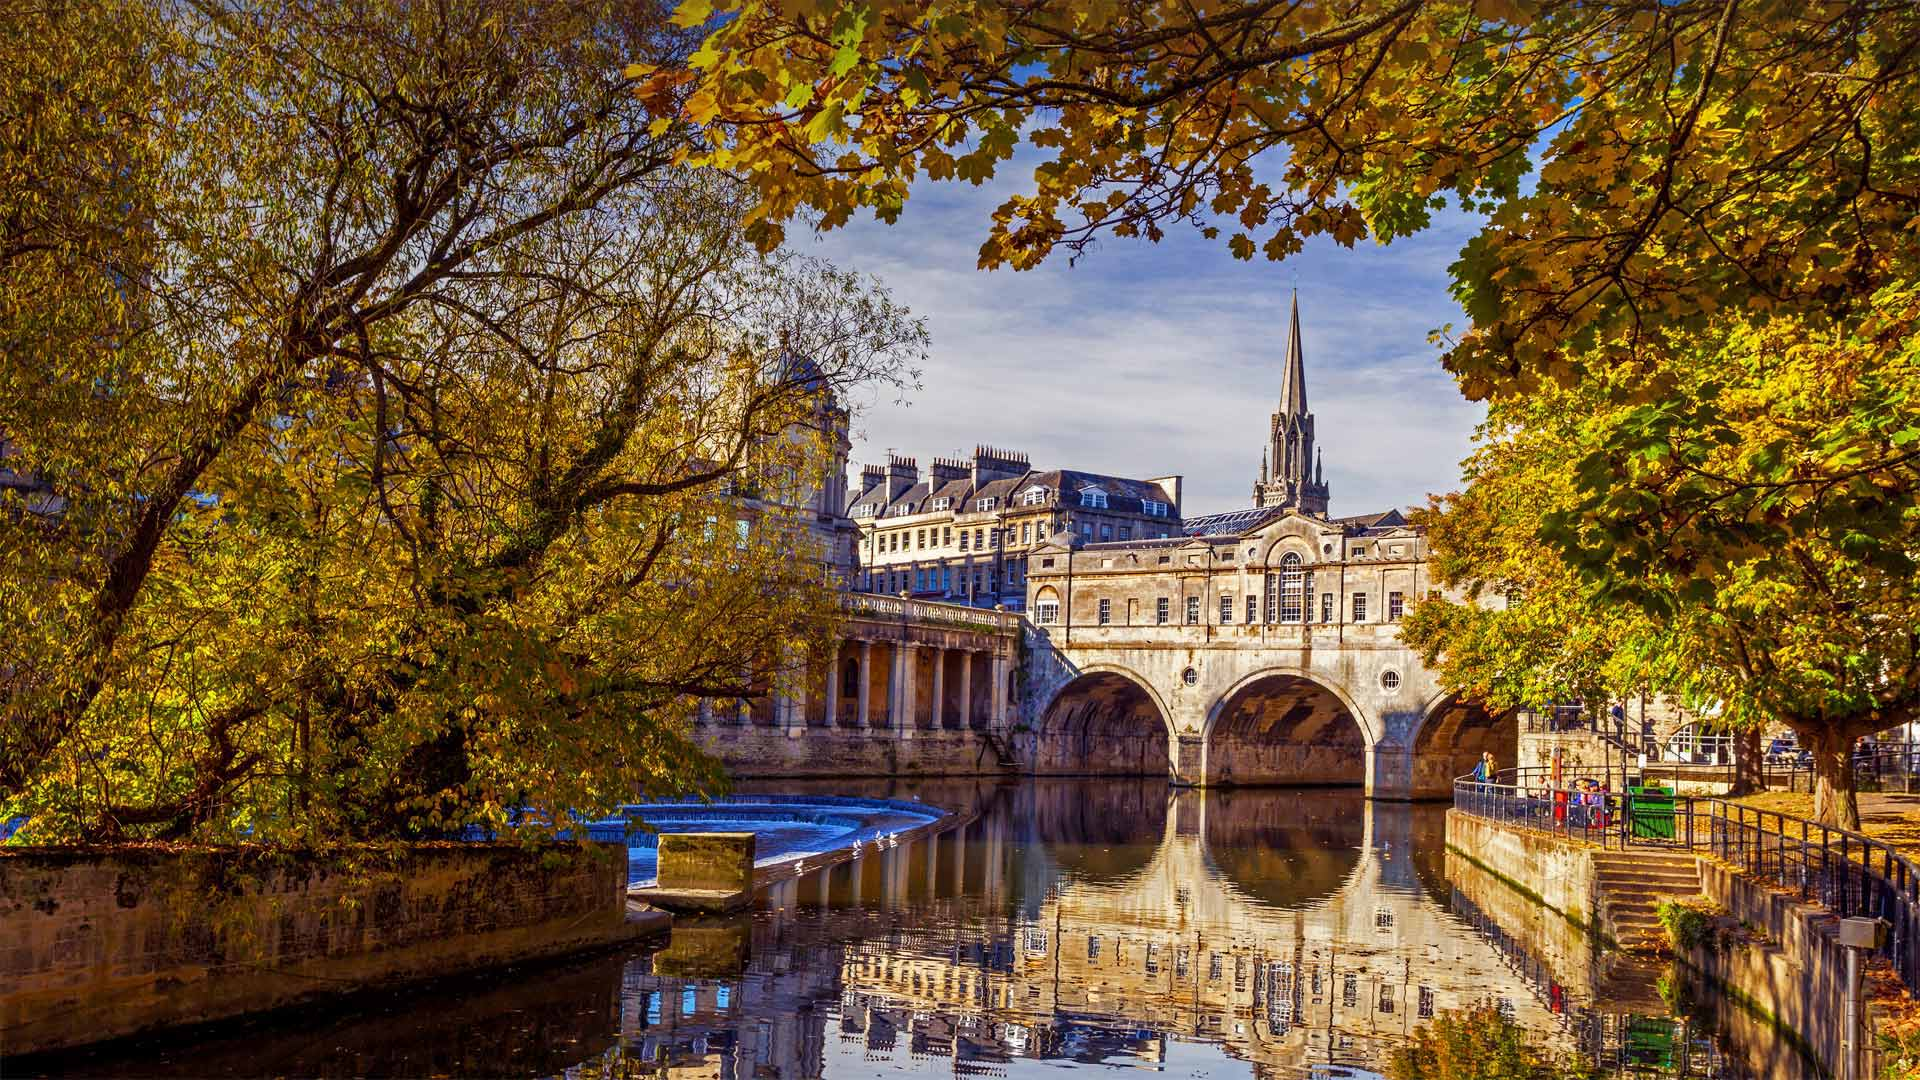 River Avon in Bath, England (© Robert Harding World Imagery/Offset by Shutterstock)